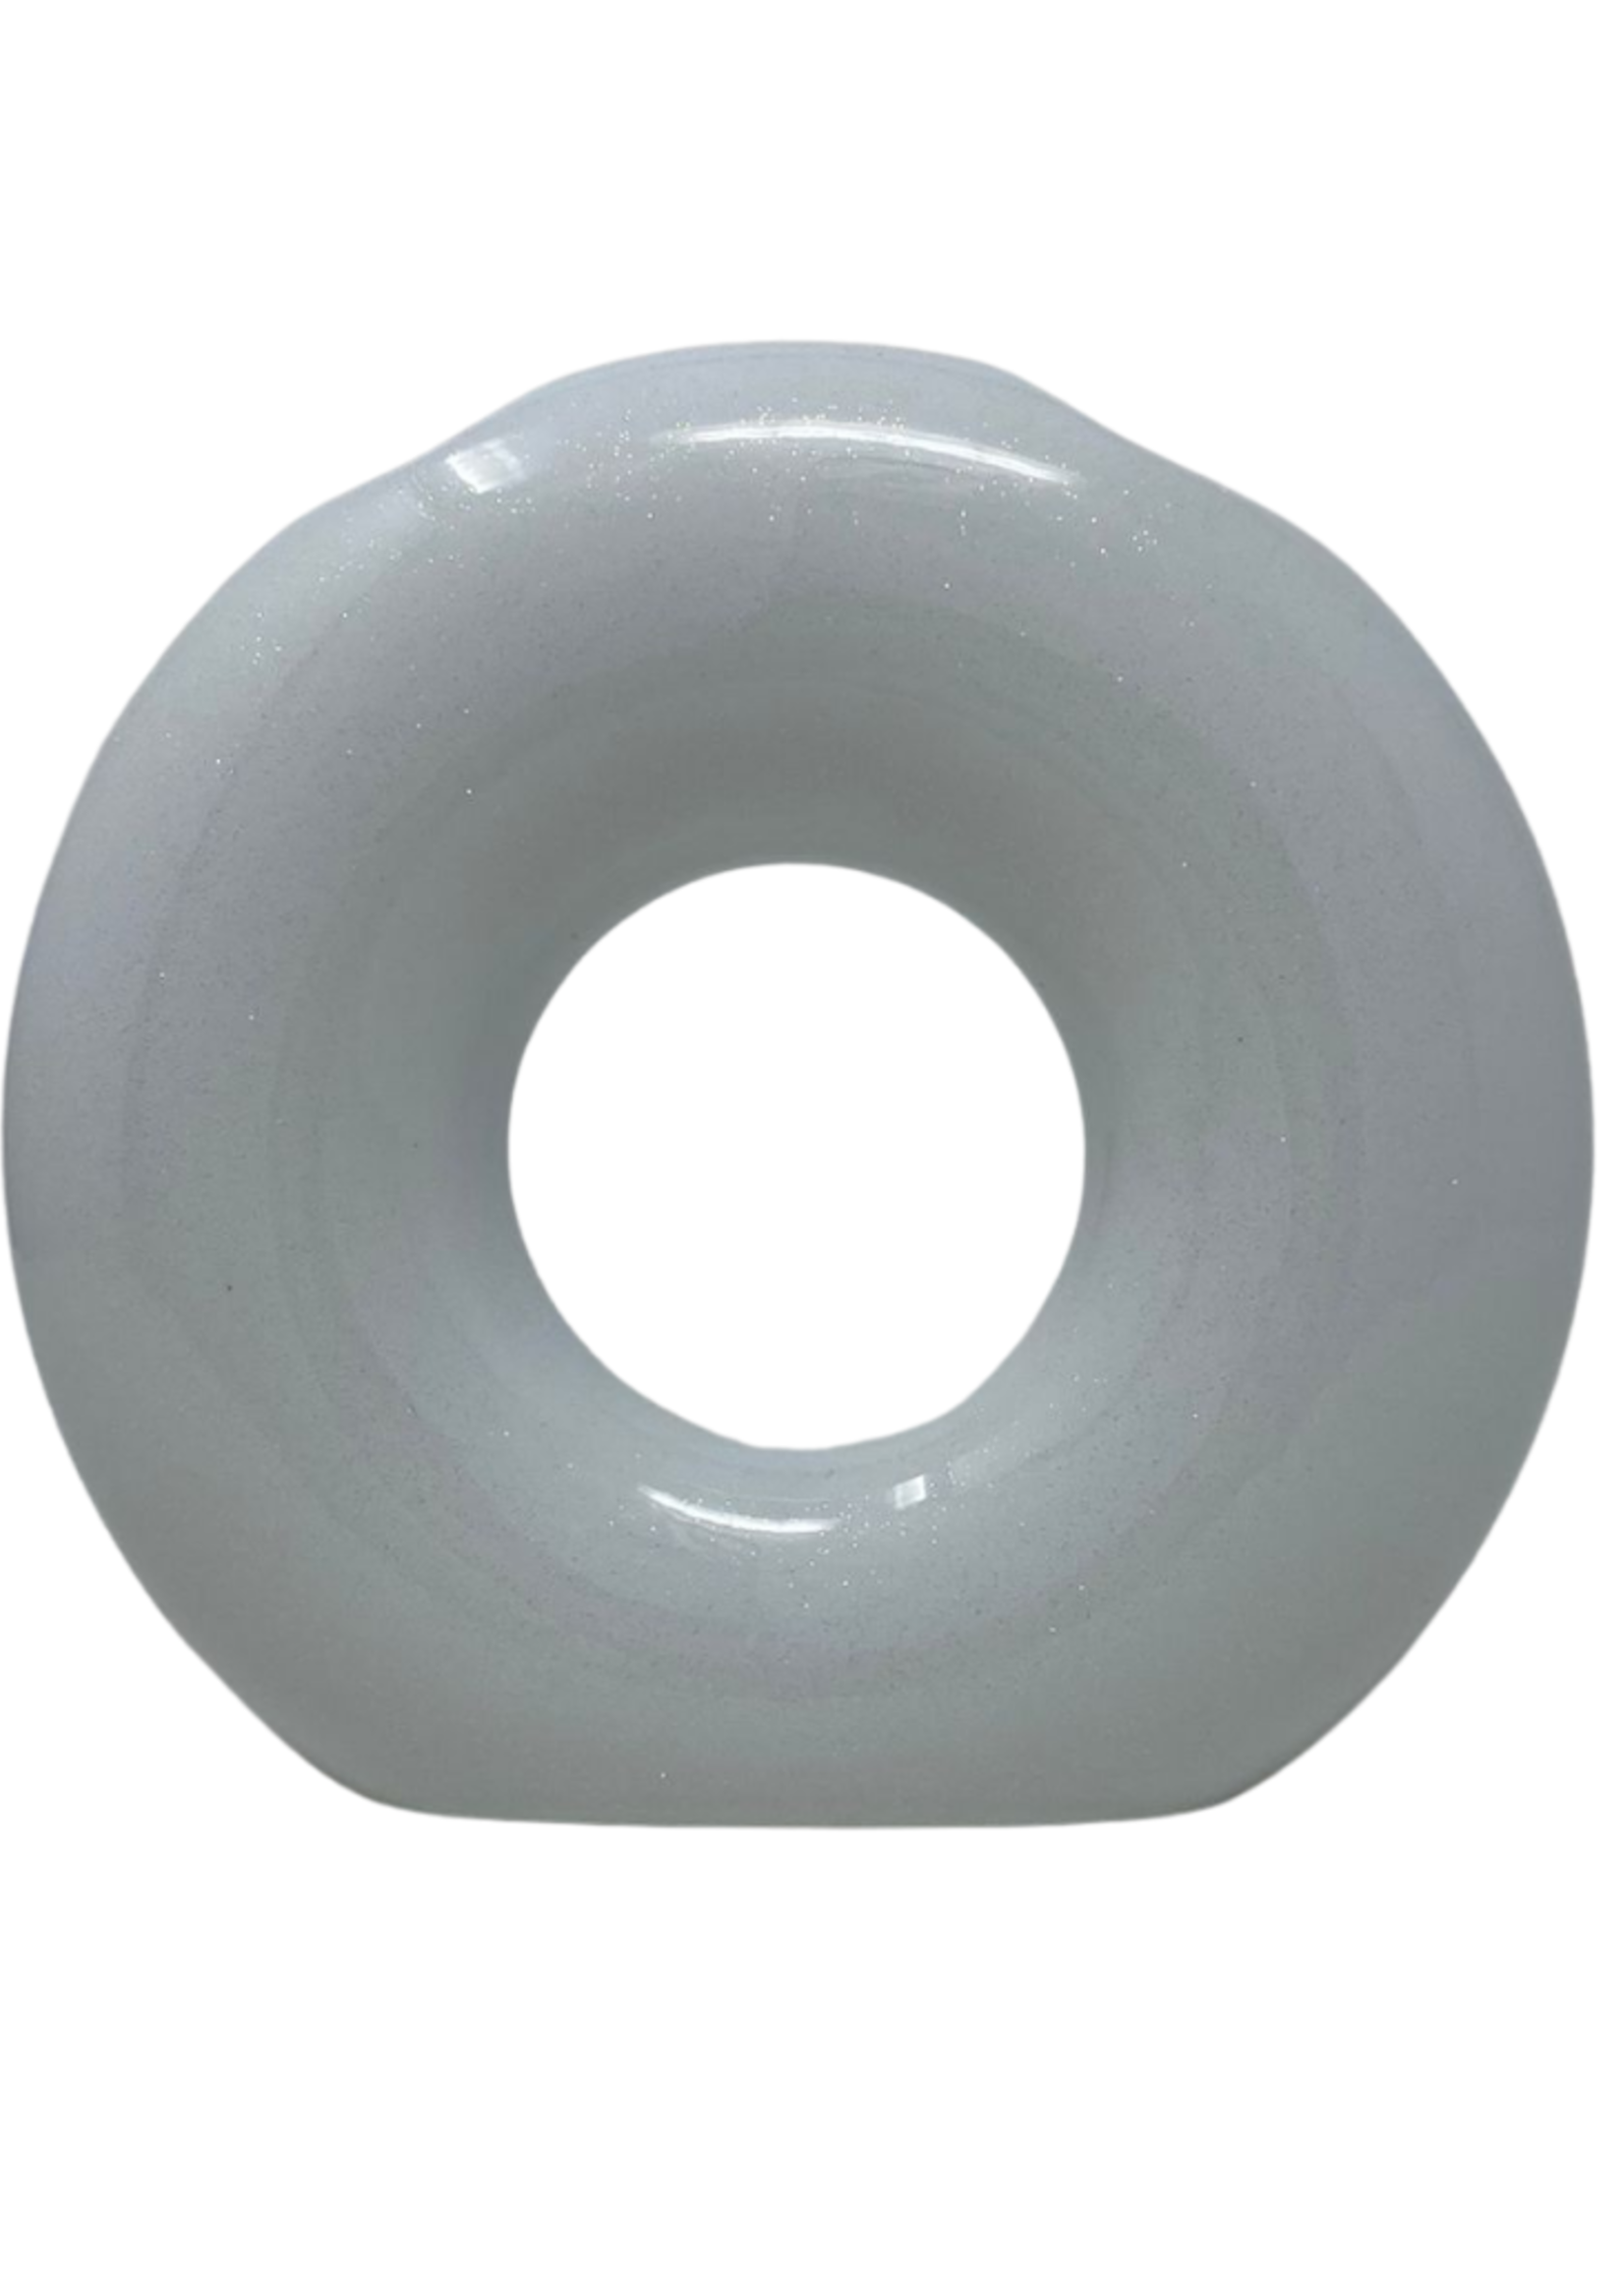 O Washing Cup | Vase White Glitter